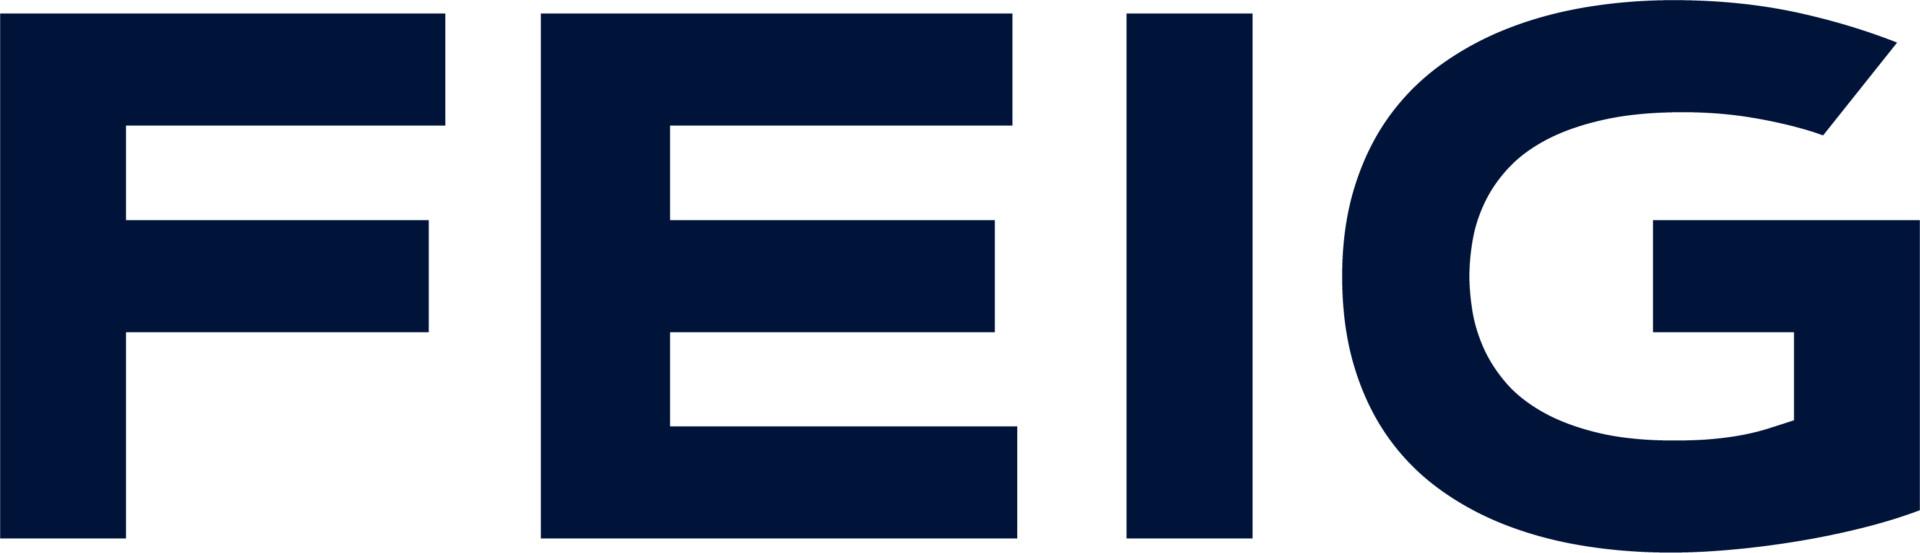 Feig Electronic GmbH